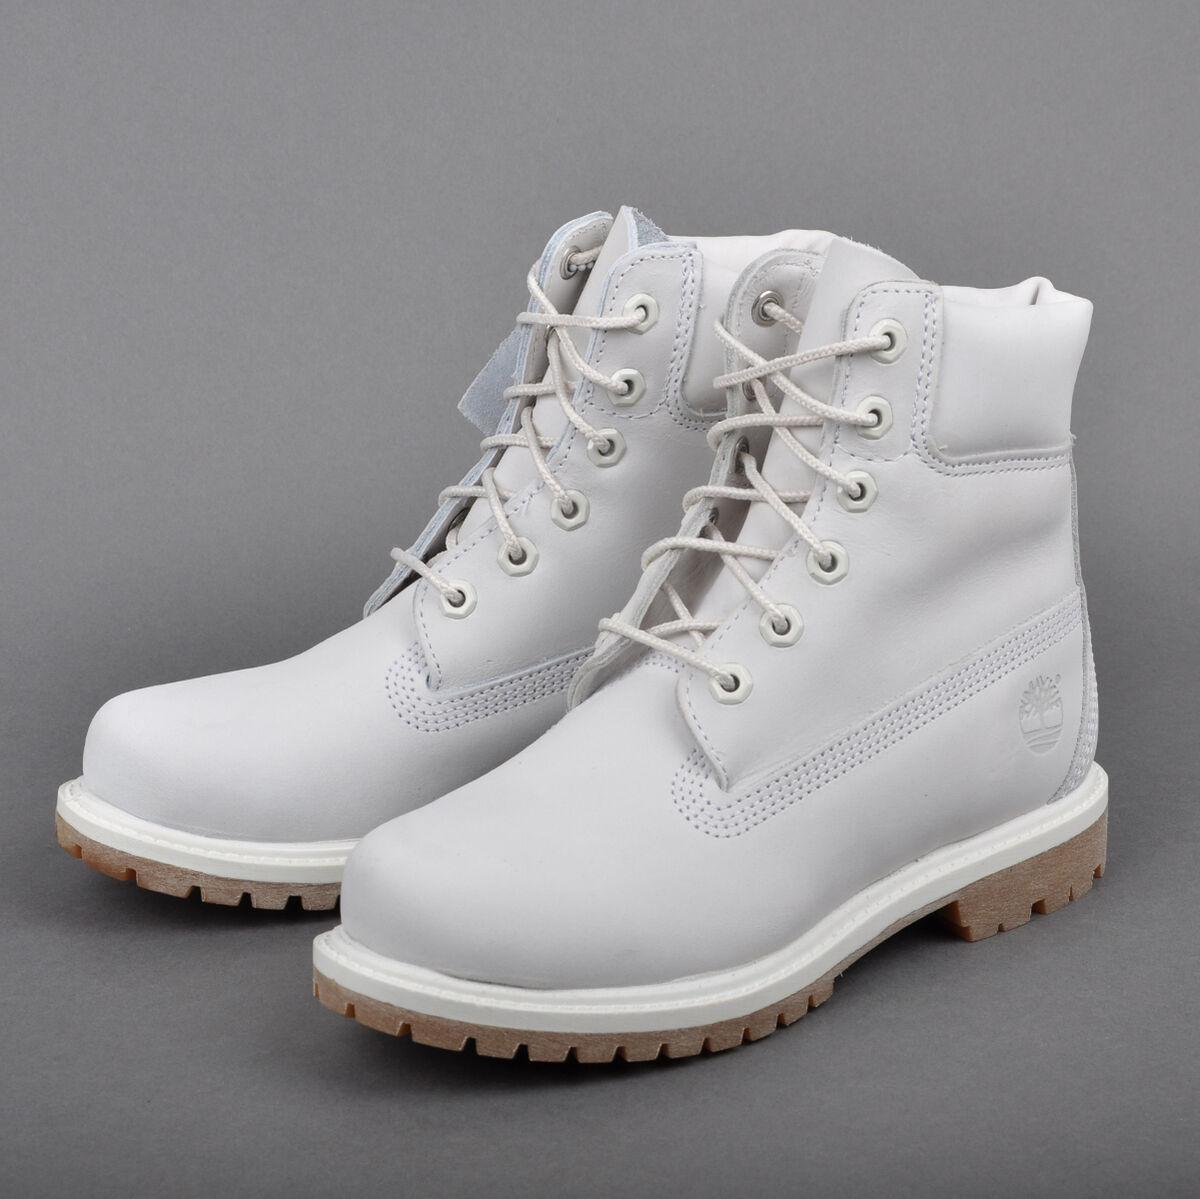 9eb6b3289f86 Timberland 6 inch Premium Boot WMNS